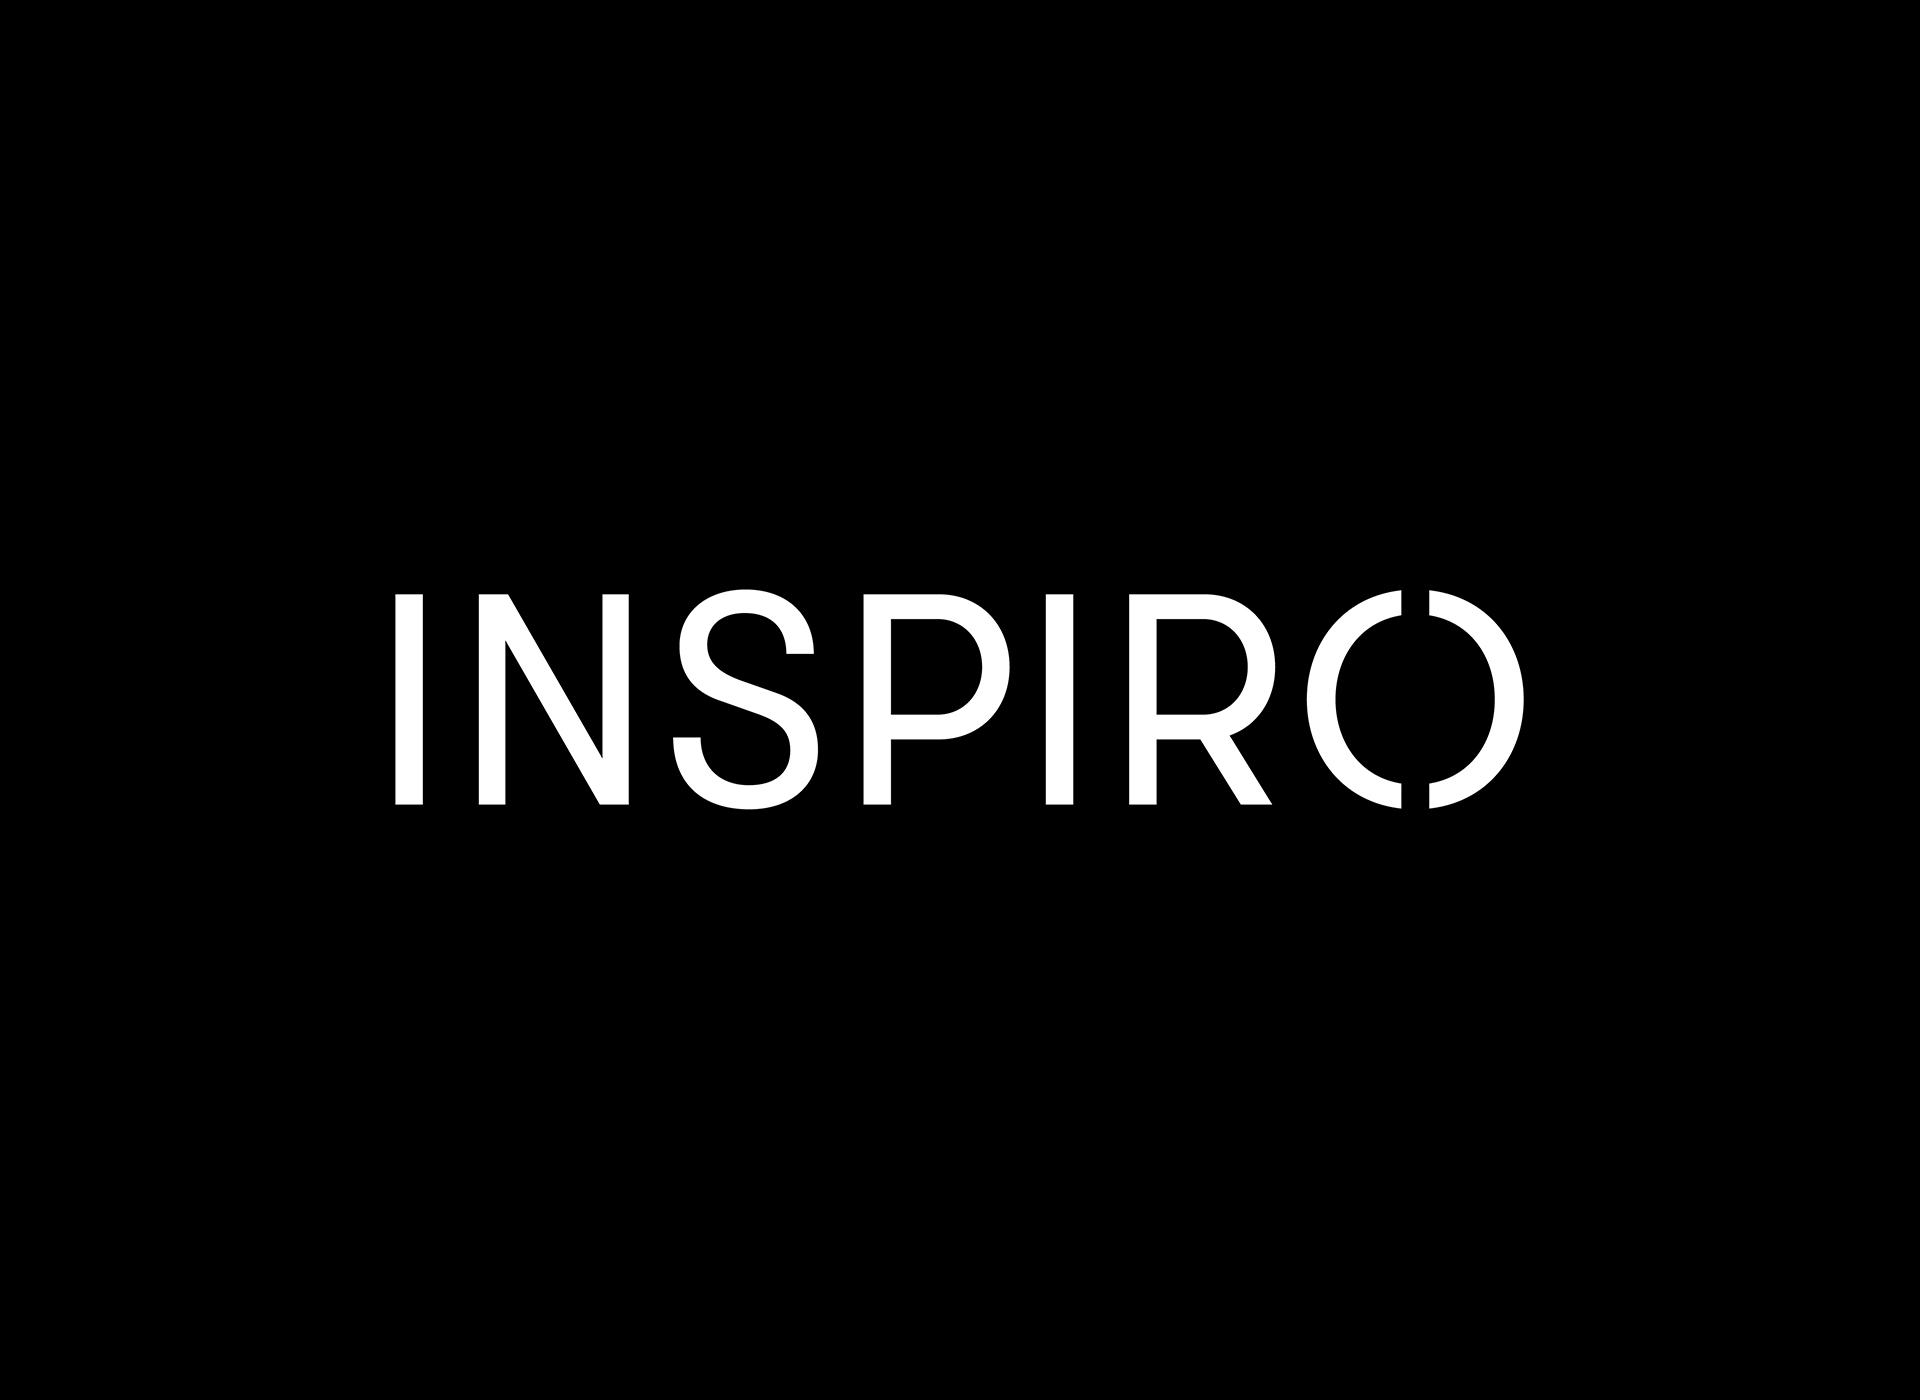 Inspiro portofoliu inoveo logo negative